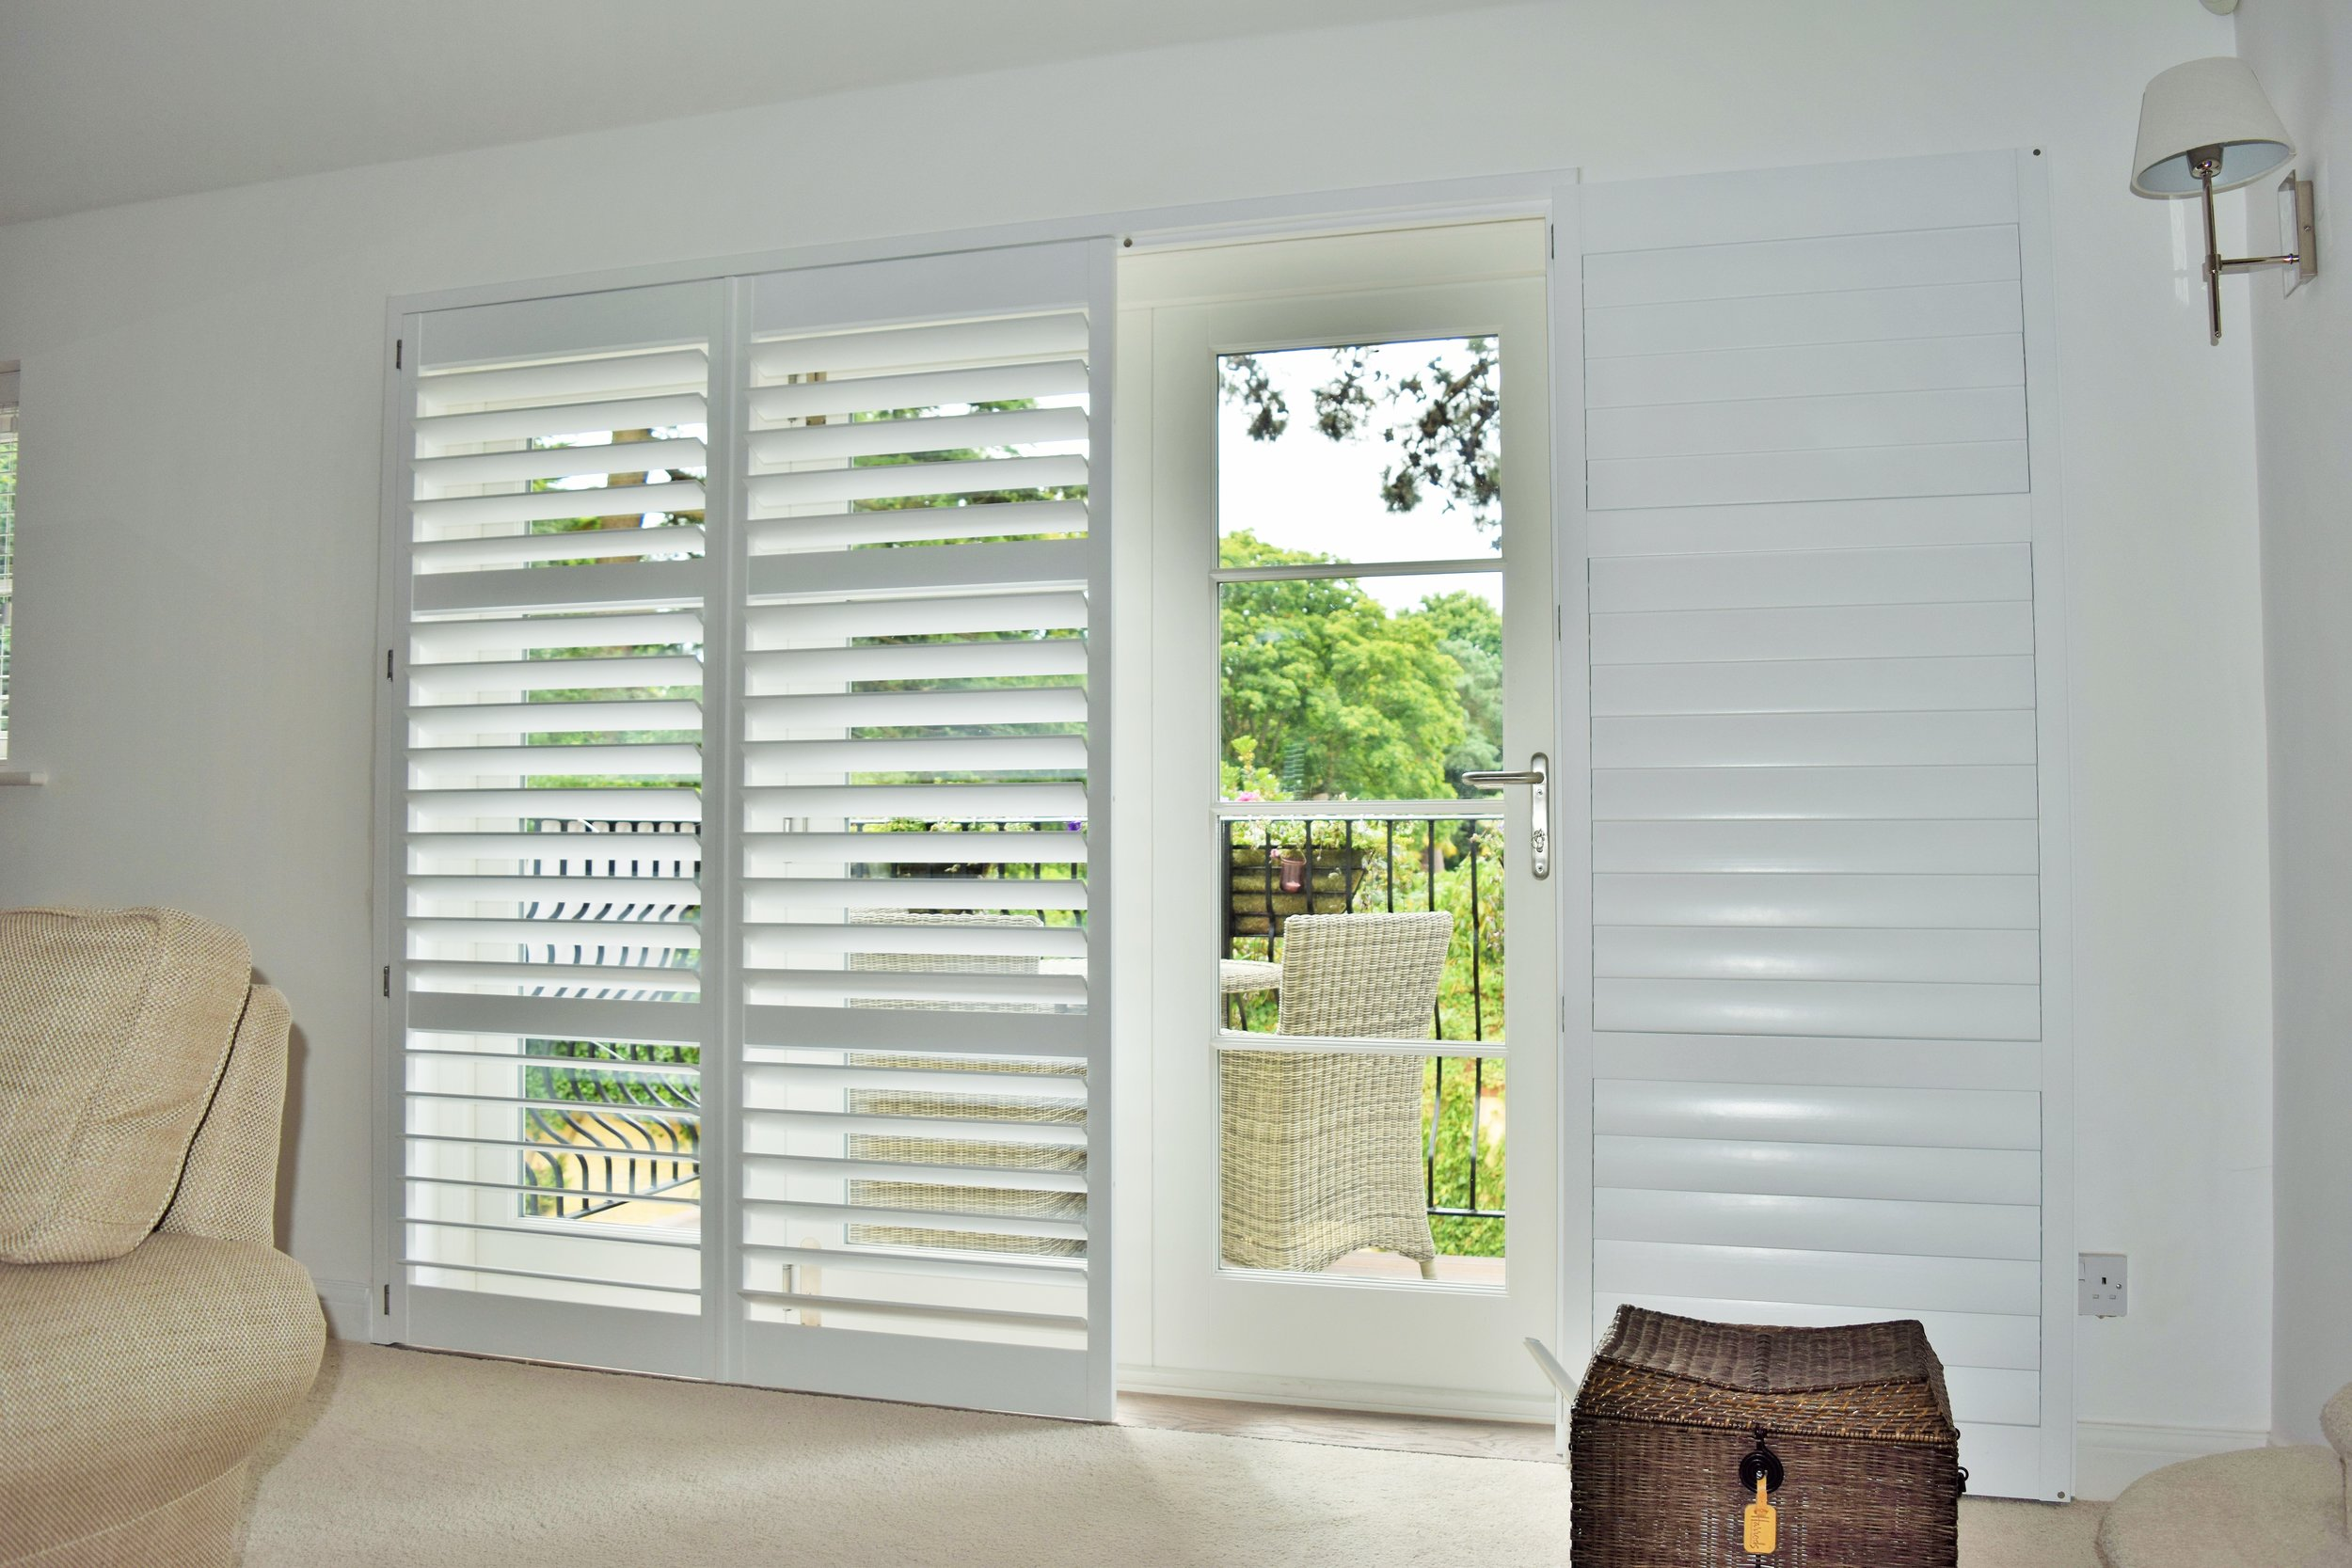 Patio door plantation shutters Poole dorset